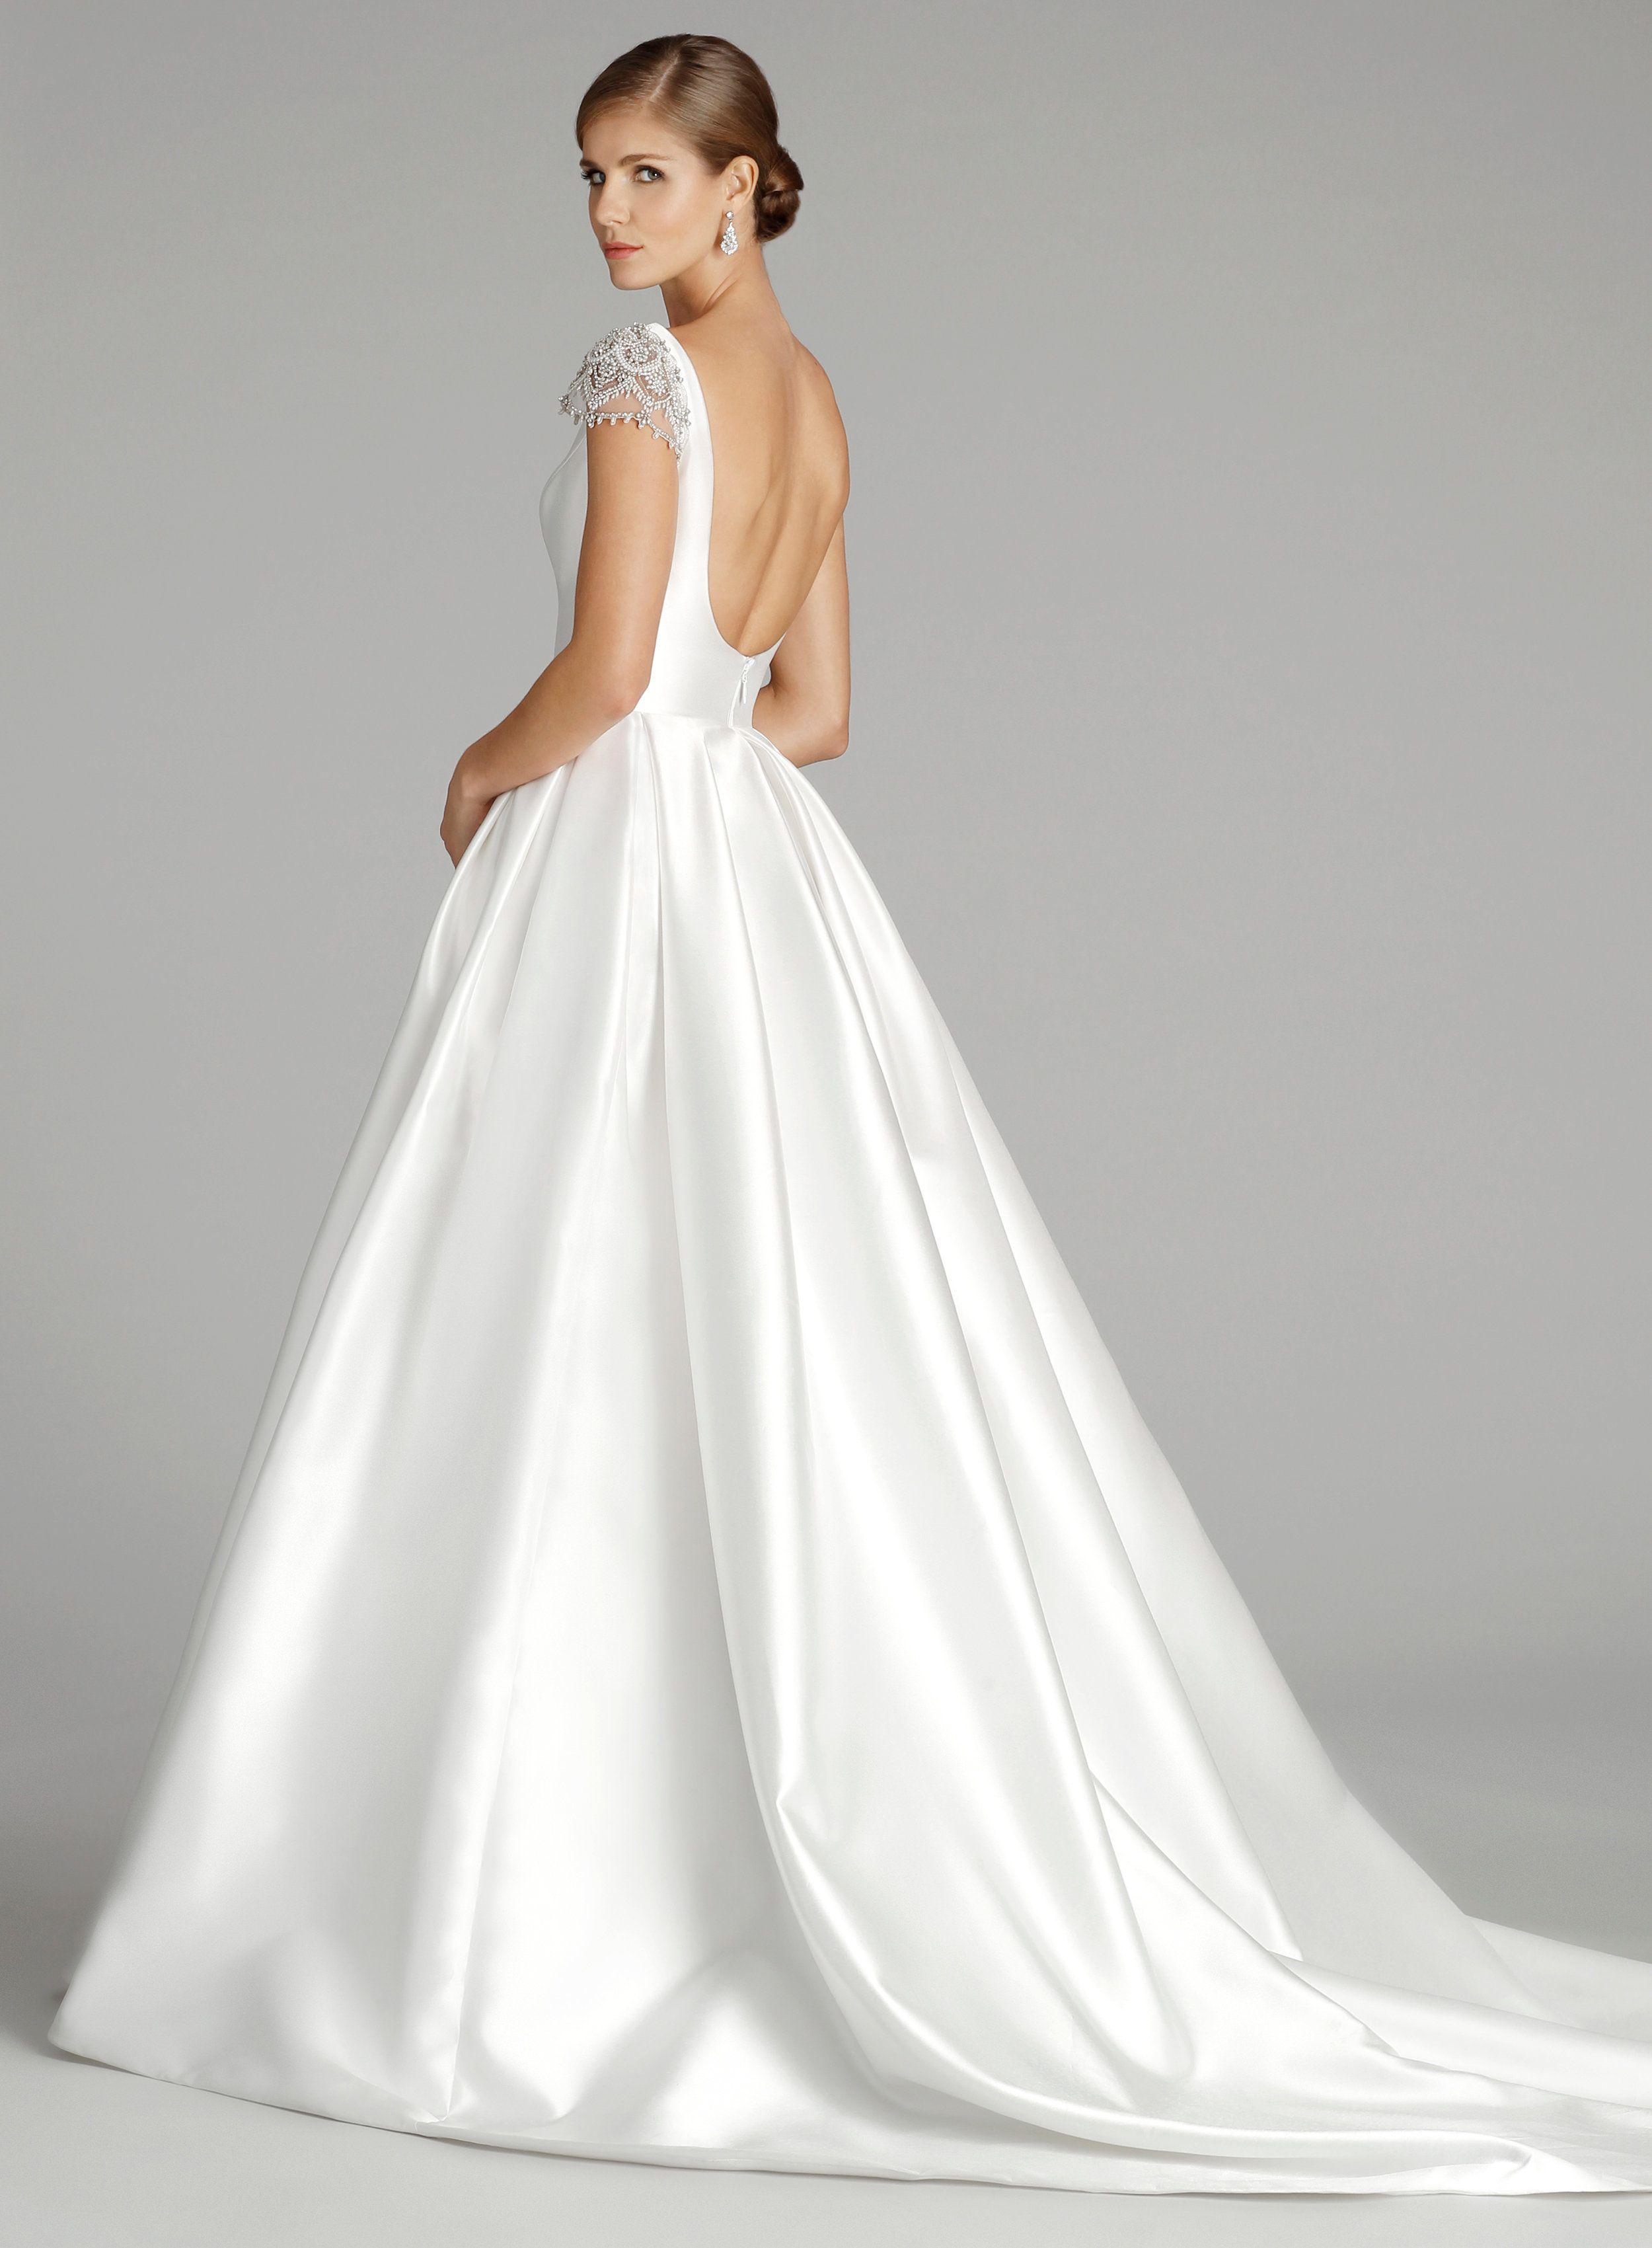 Alvina valenta l fall l style look book back stunning